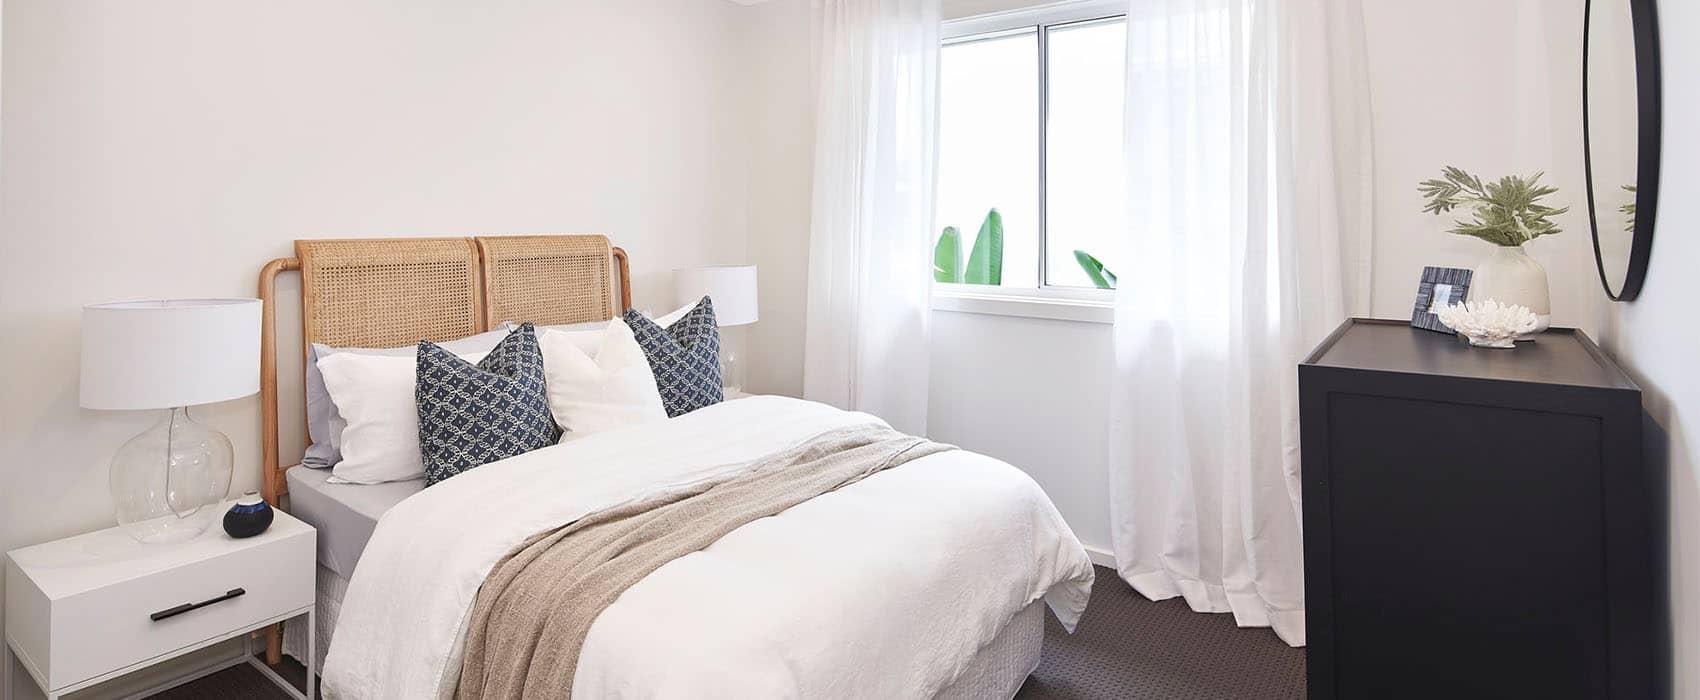 masterton-malibu29-northhampton_bedroom_03 Interior